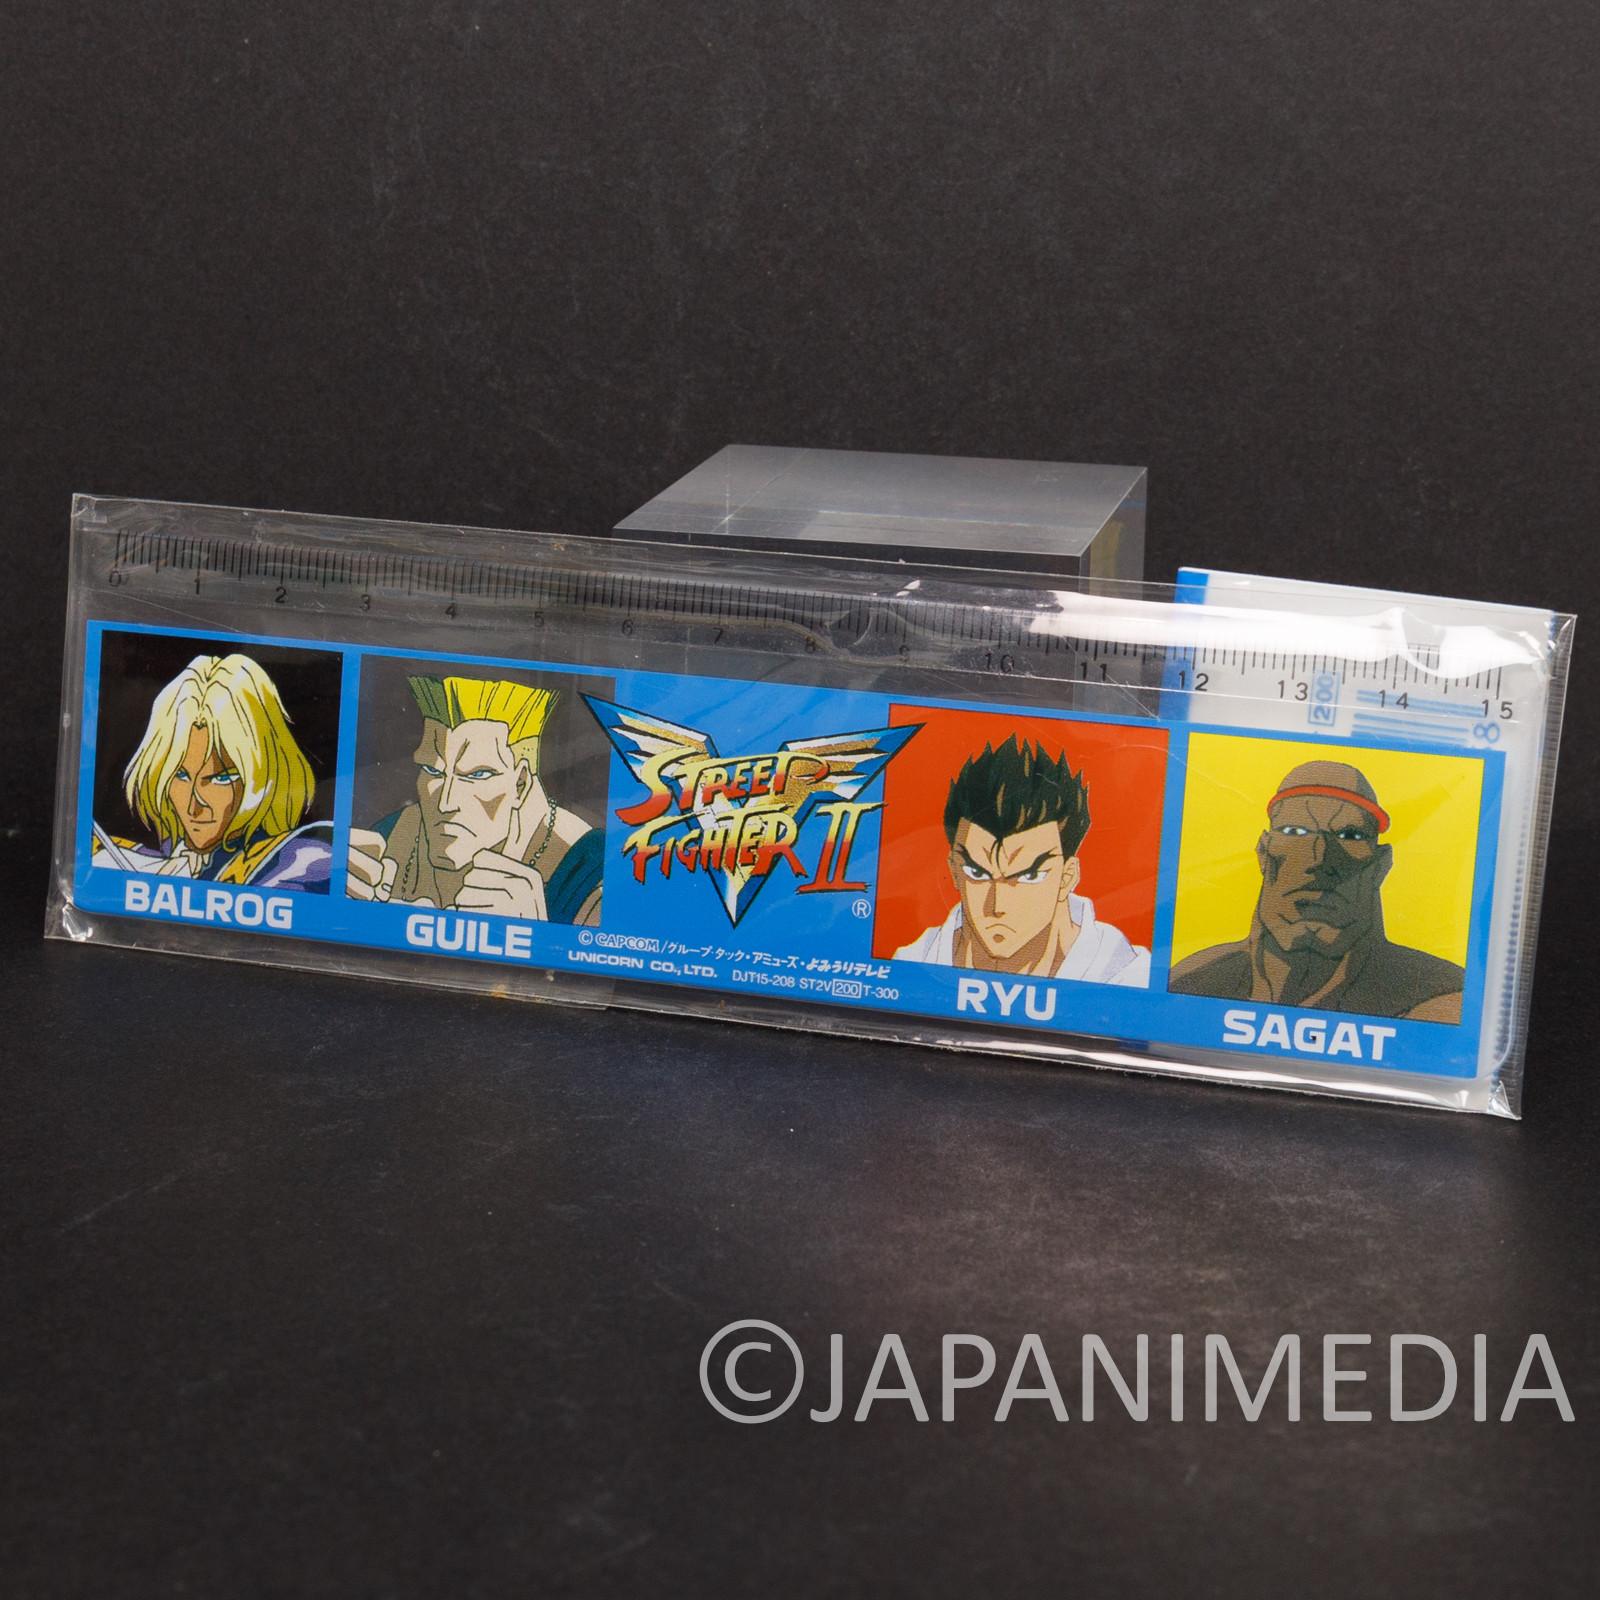 Street Fighter 2 Animation Ruler 15cm RYU / GUILE / SAGAT / VEGA (BALROG)